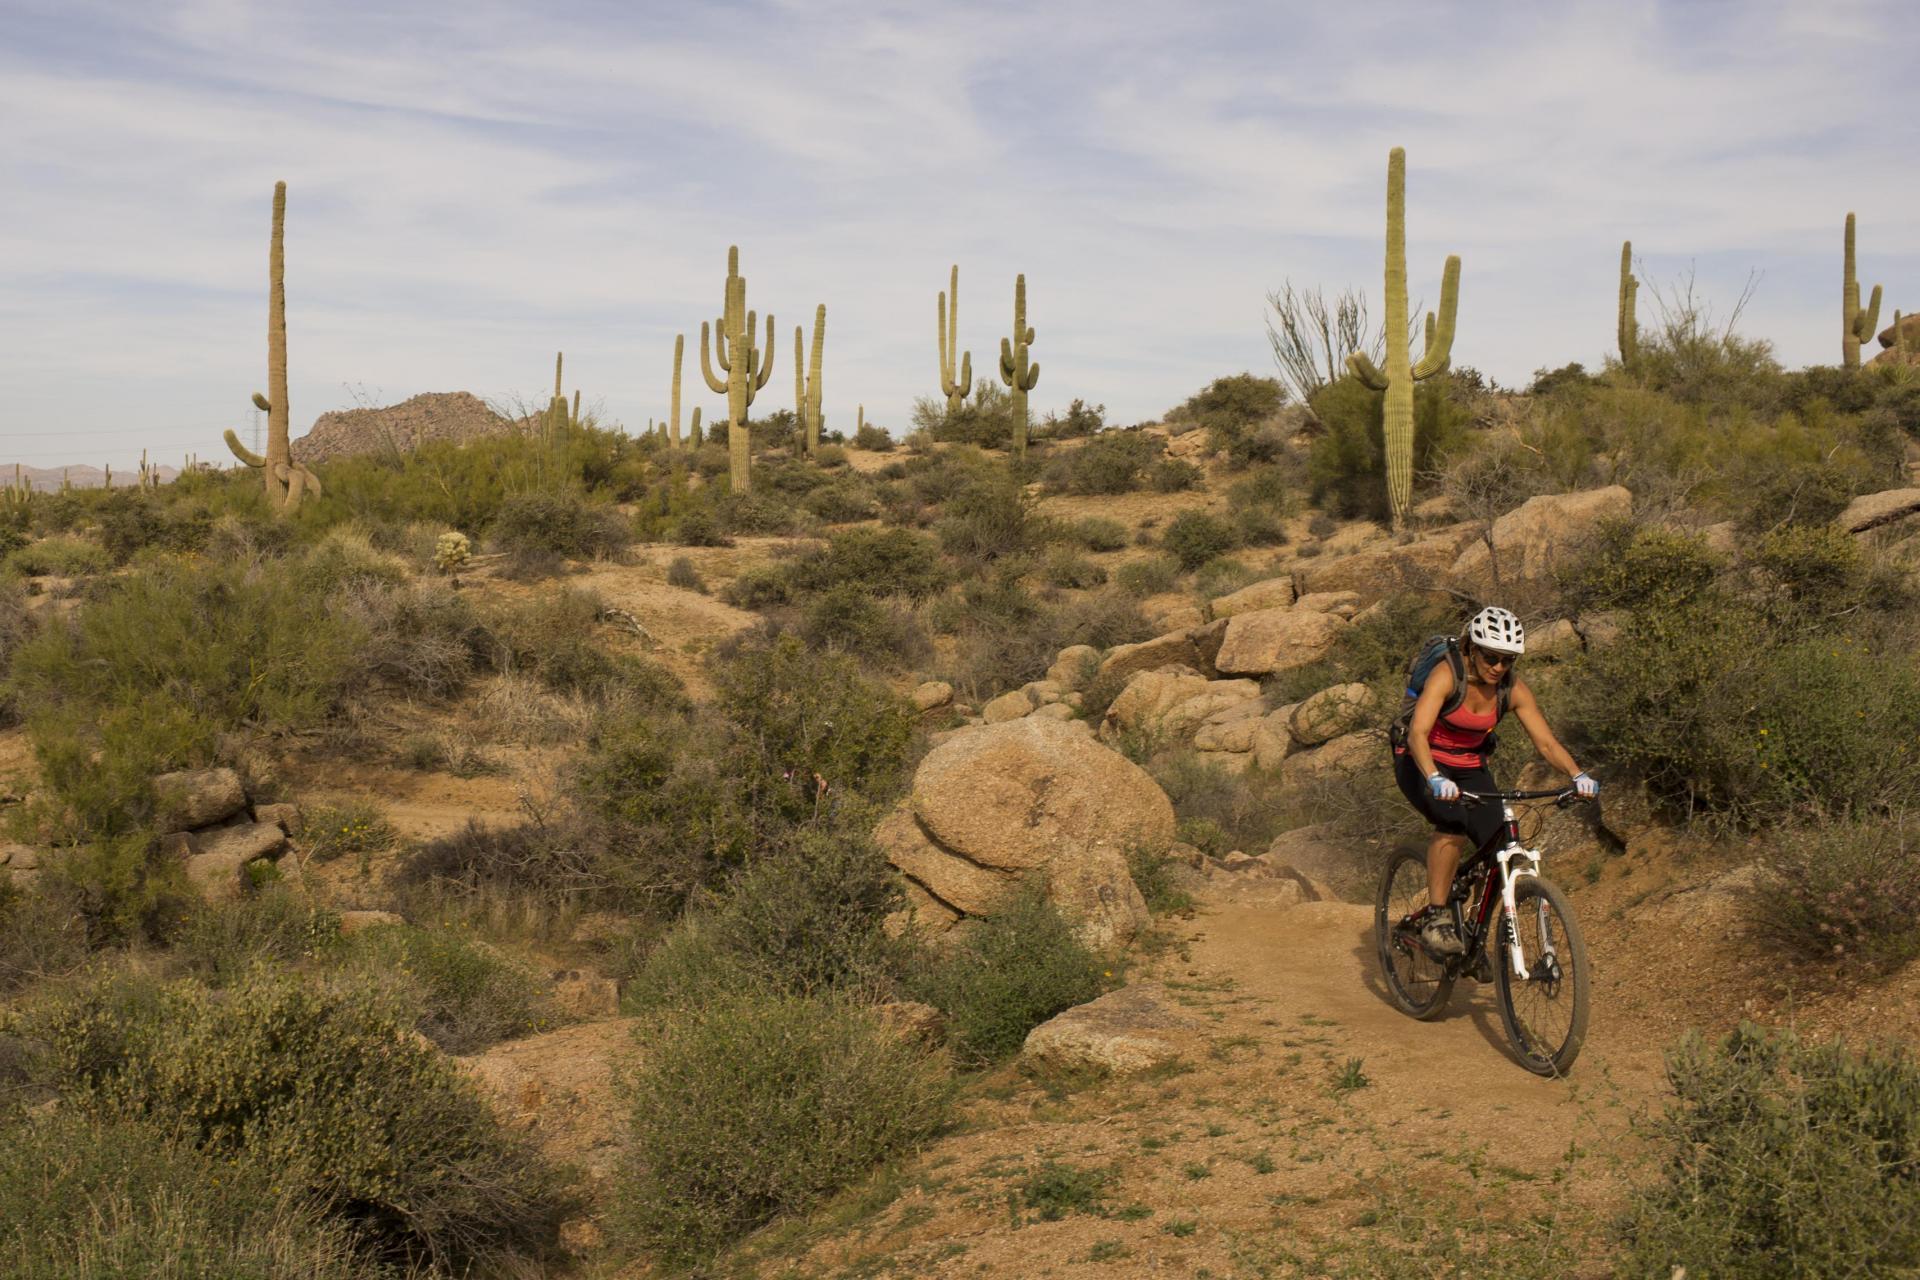 Guided Mountain Bike Tours Arizona Easy Desert Cycling Adventures